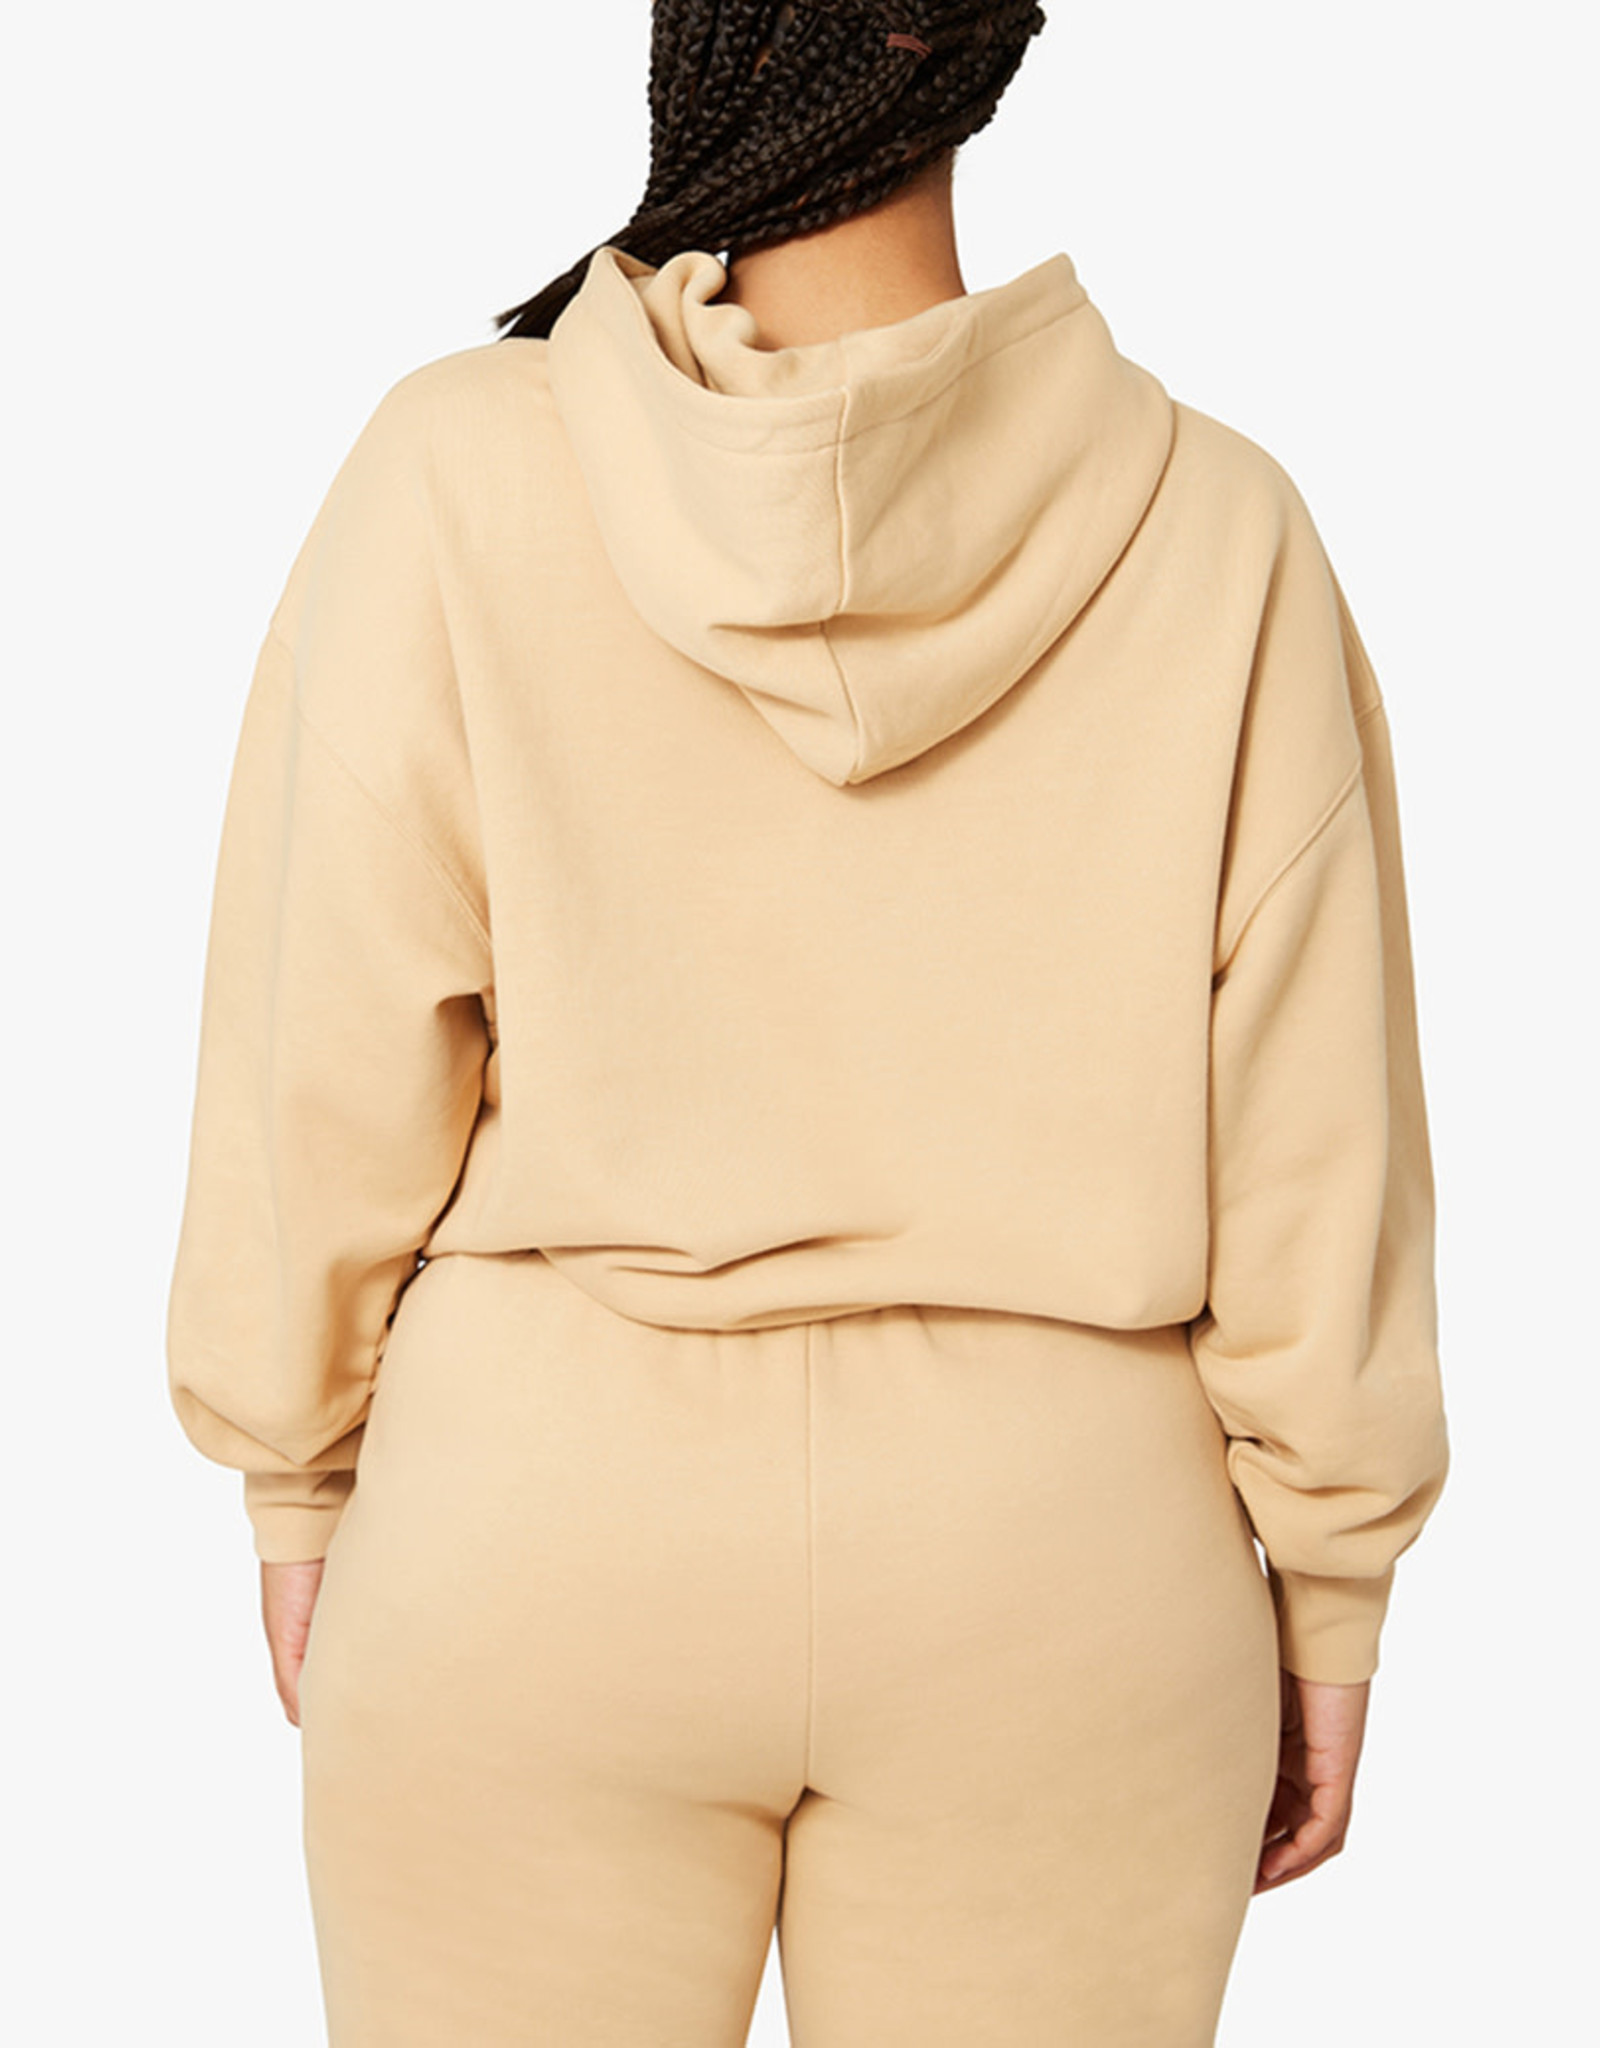 Shop WeWoreWhat Tan Oversized Hoodie